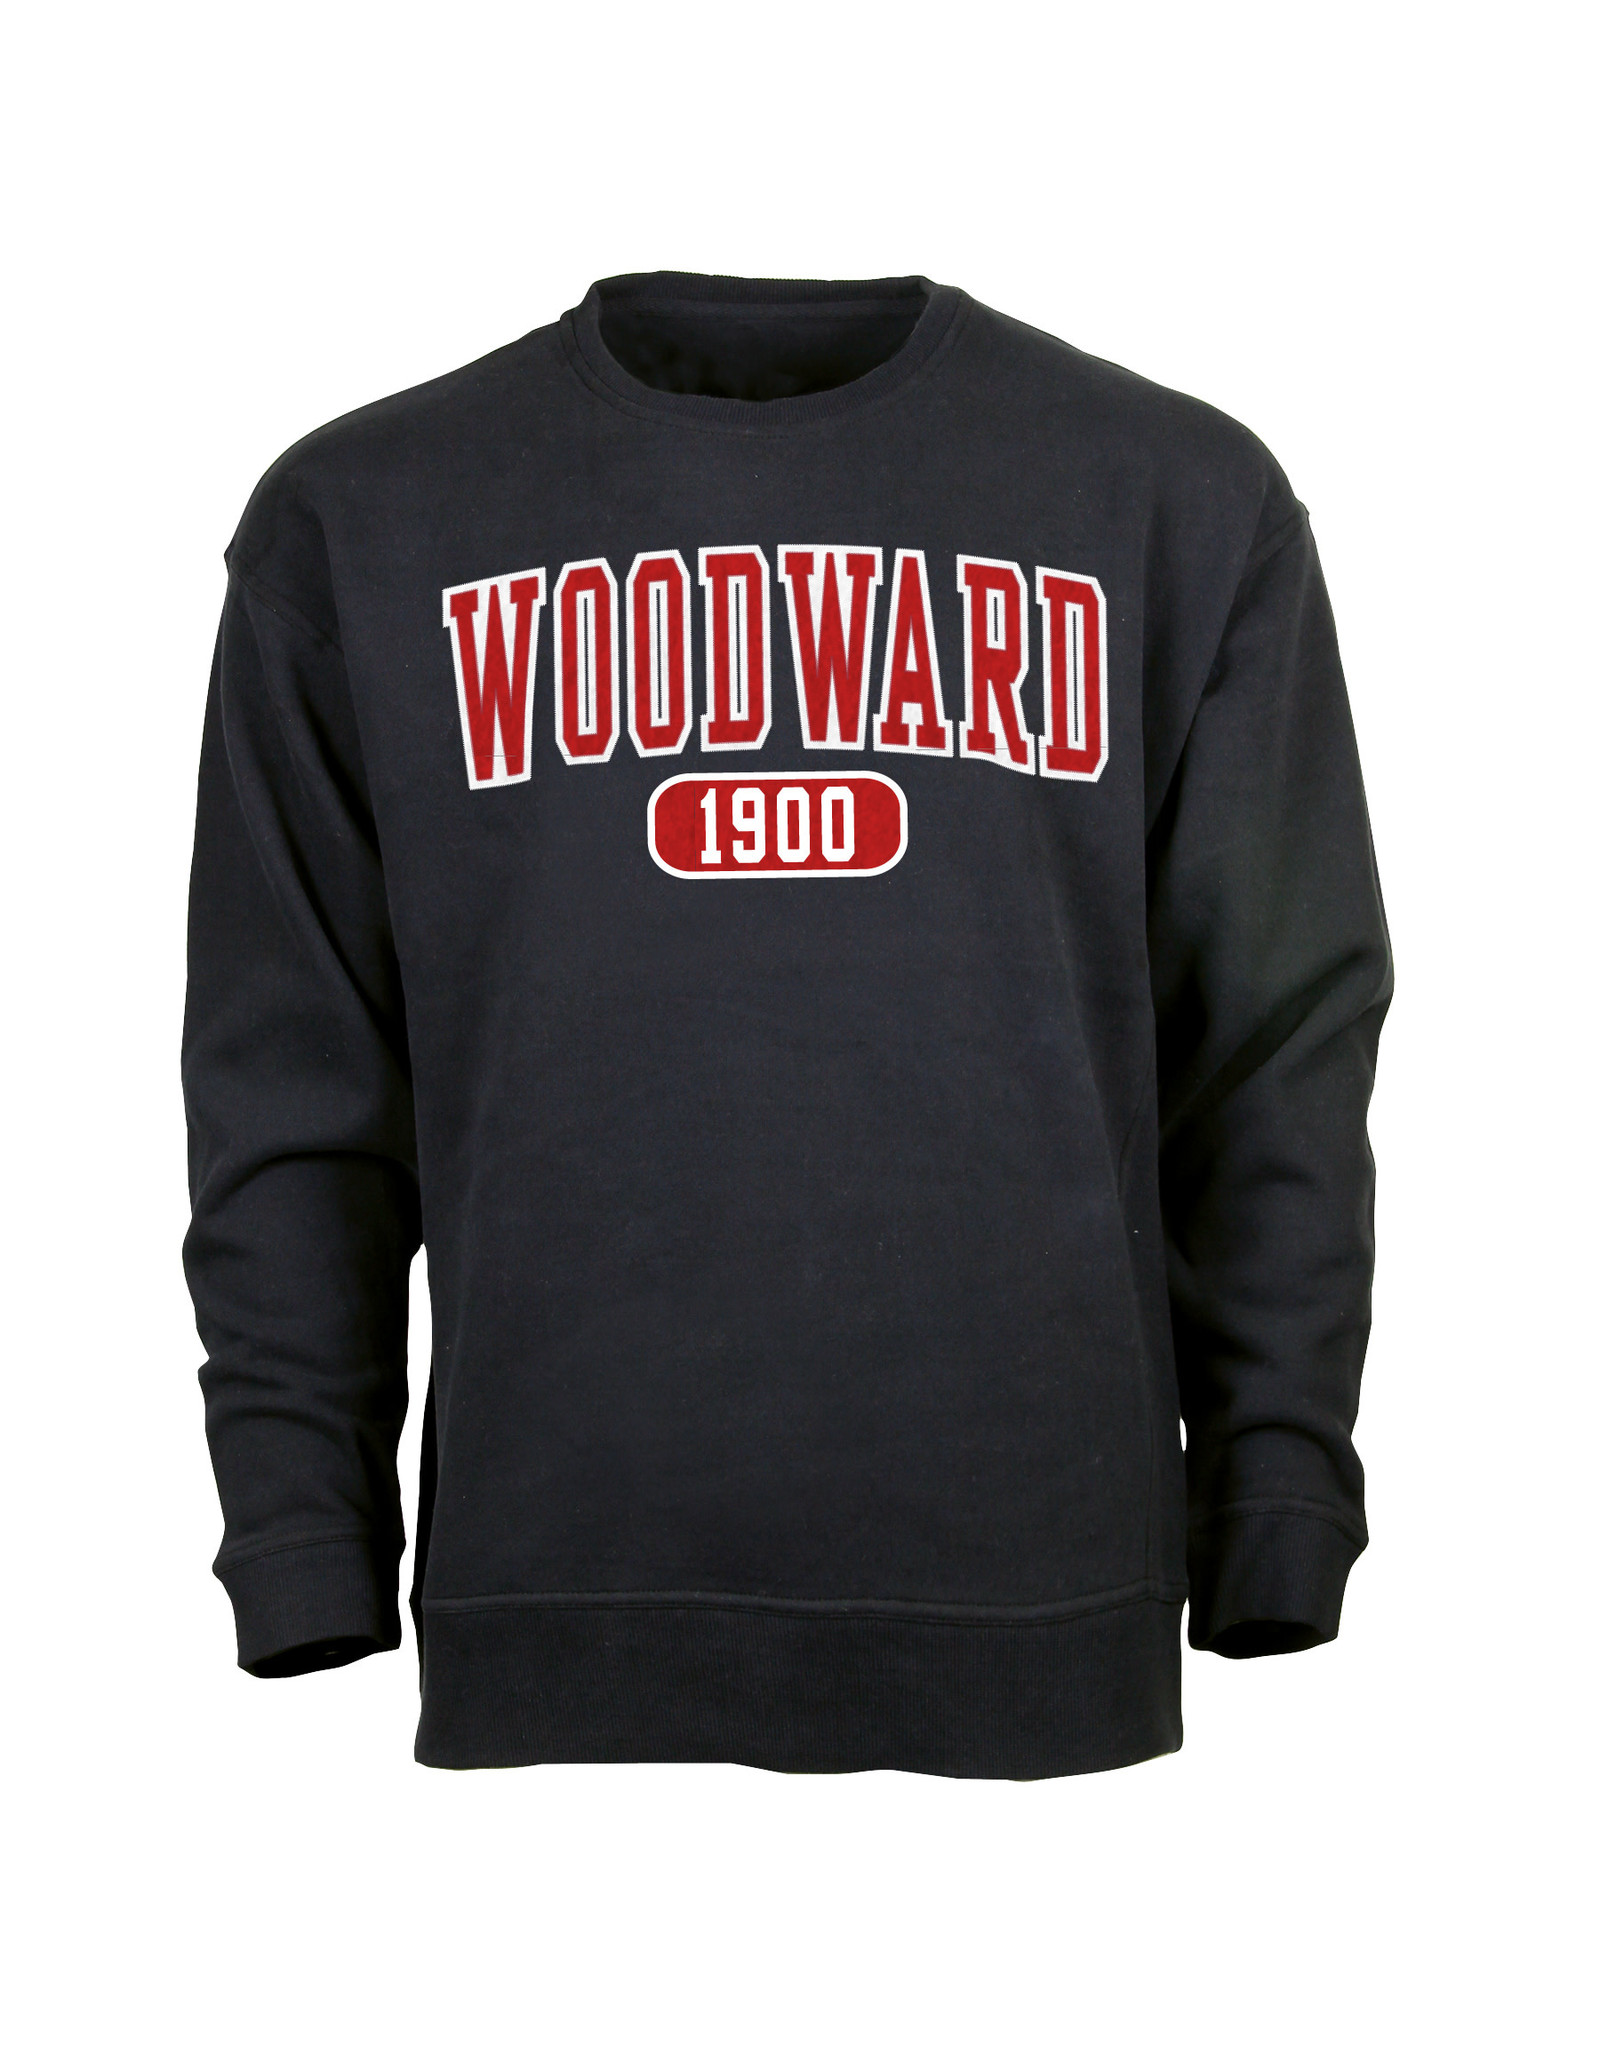 Ouray Woodward 1900 Crew Sweatshirt in Black